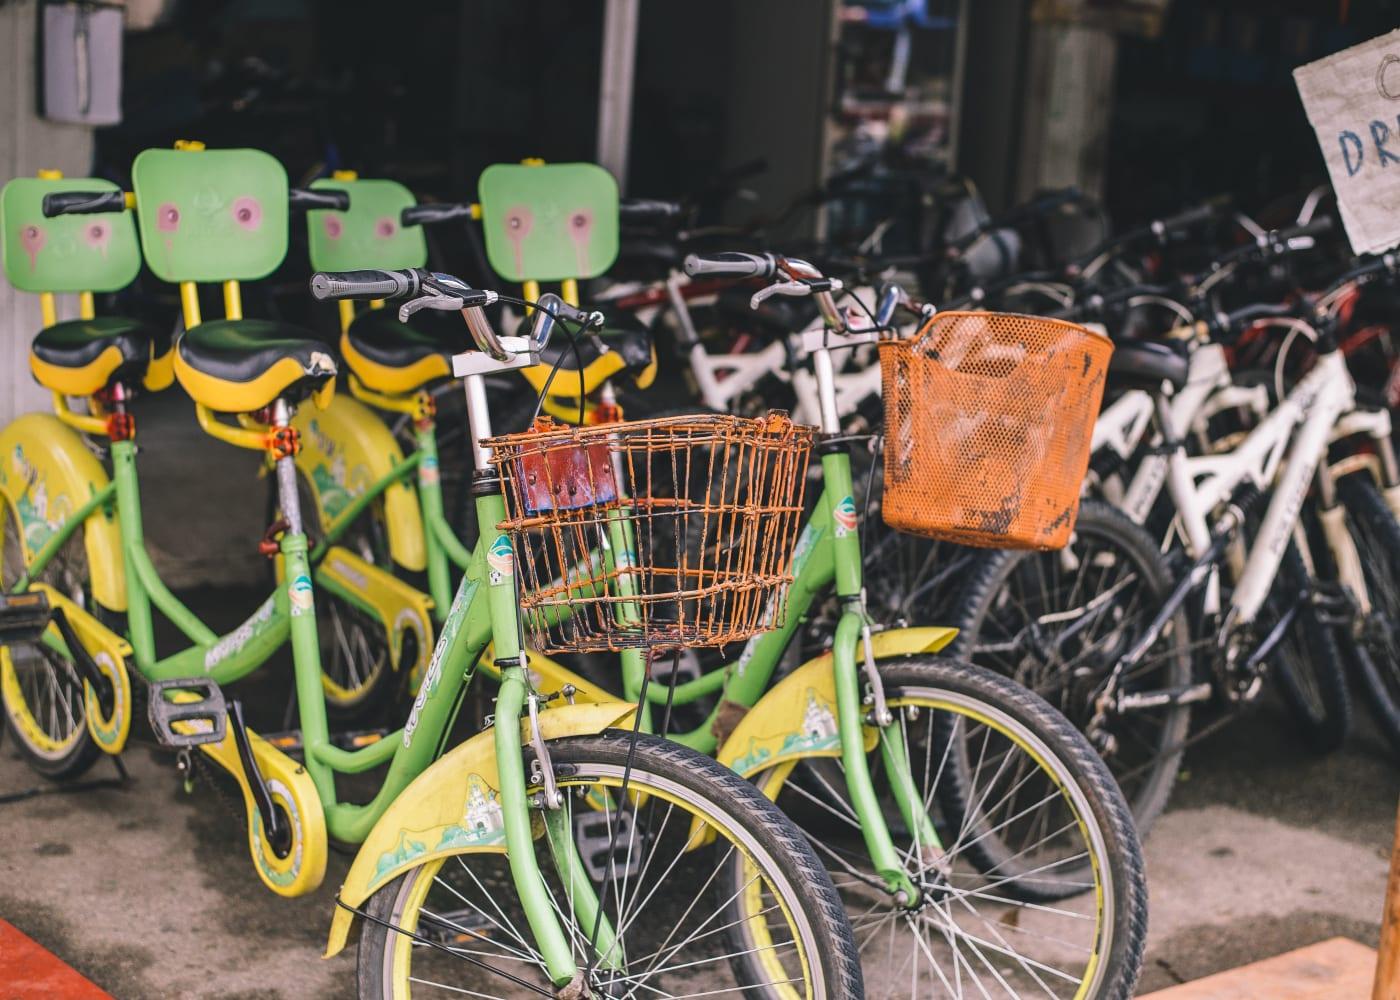 pulau ubin bike rides in singapore